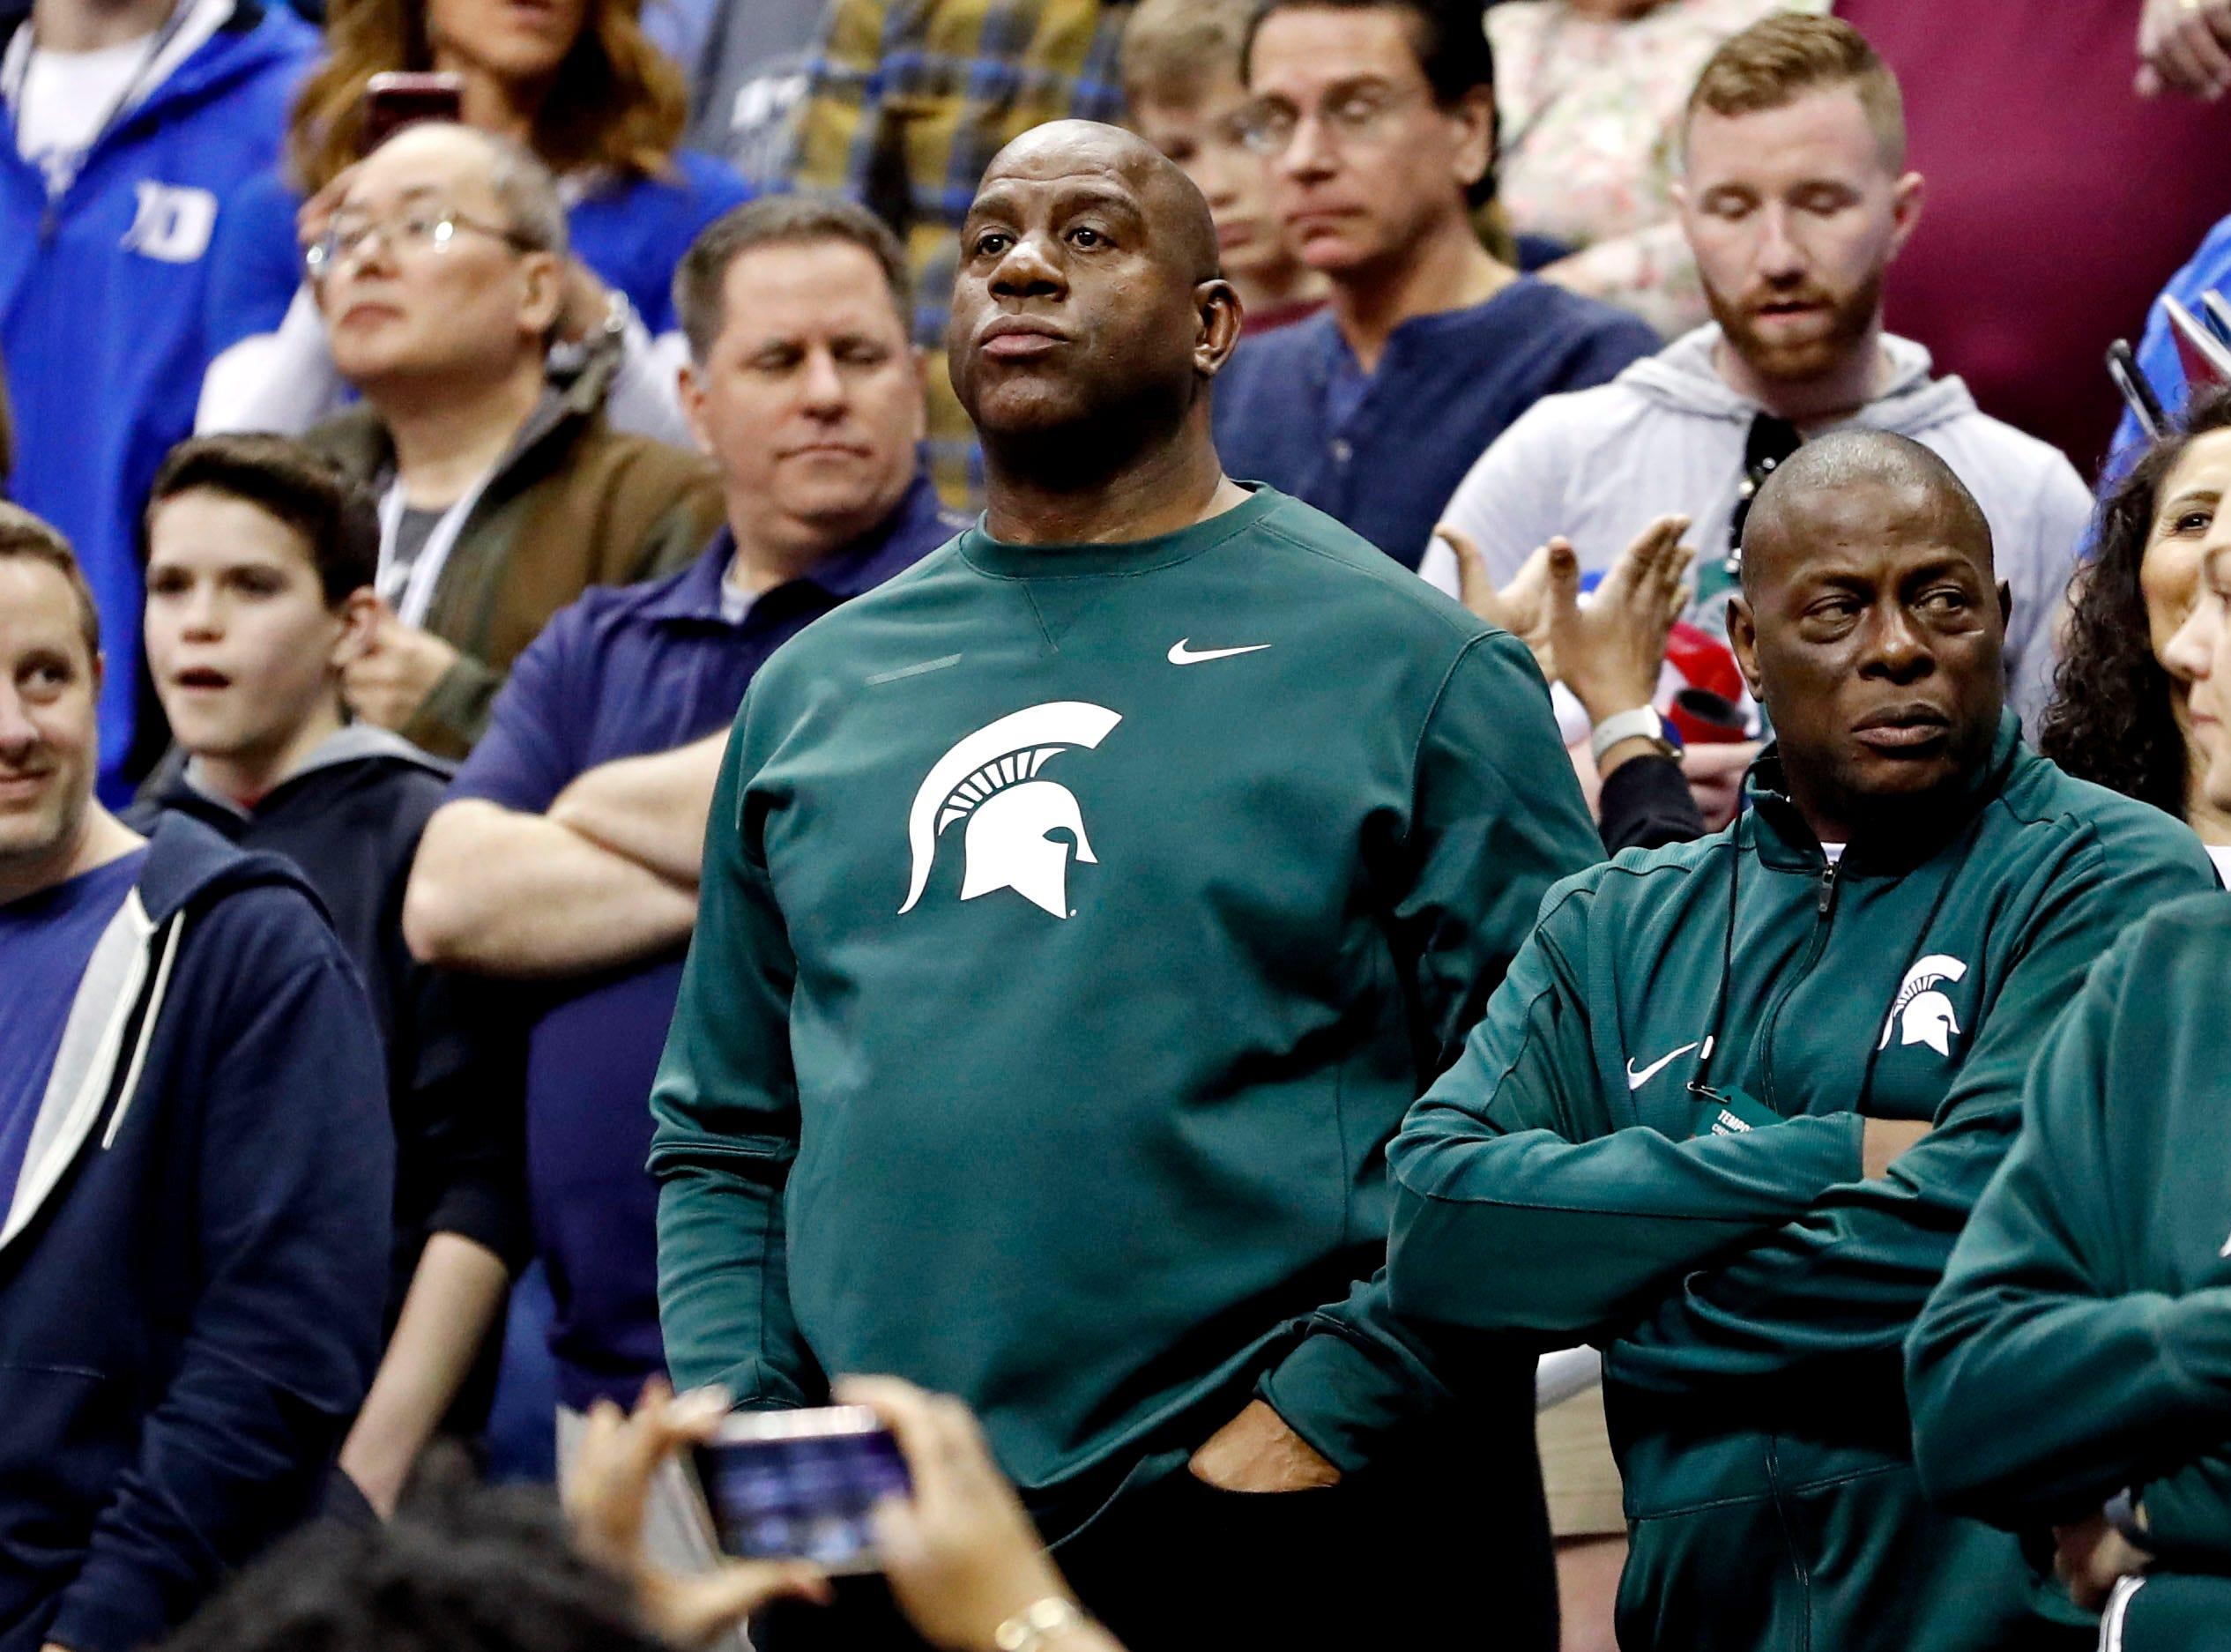 Magic Johnson watches Michigan State play against Duke during the 2019 NCAA Tournament.